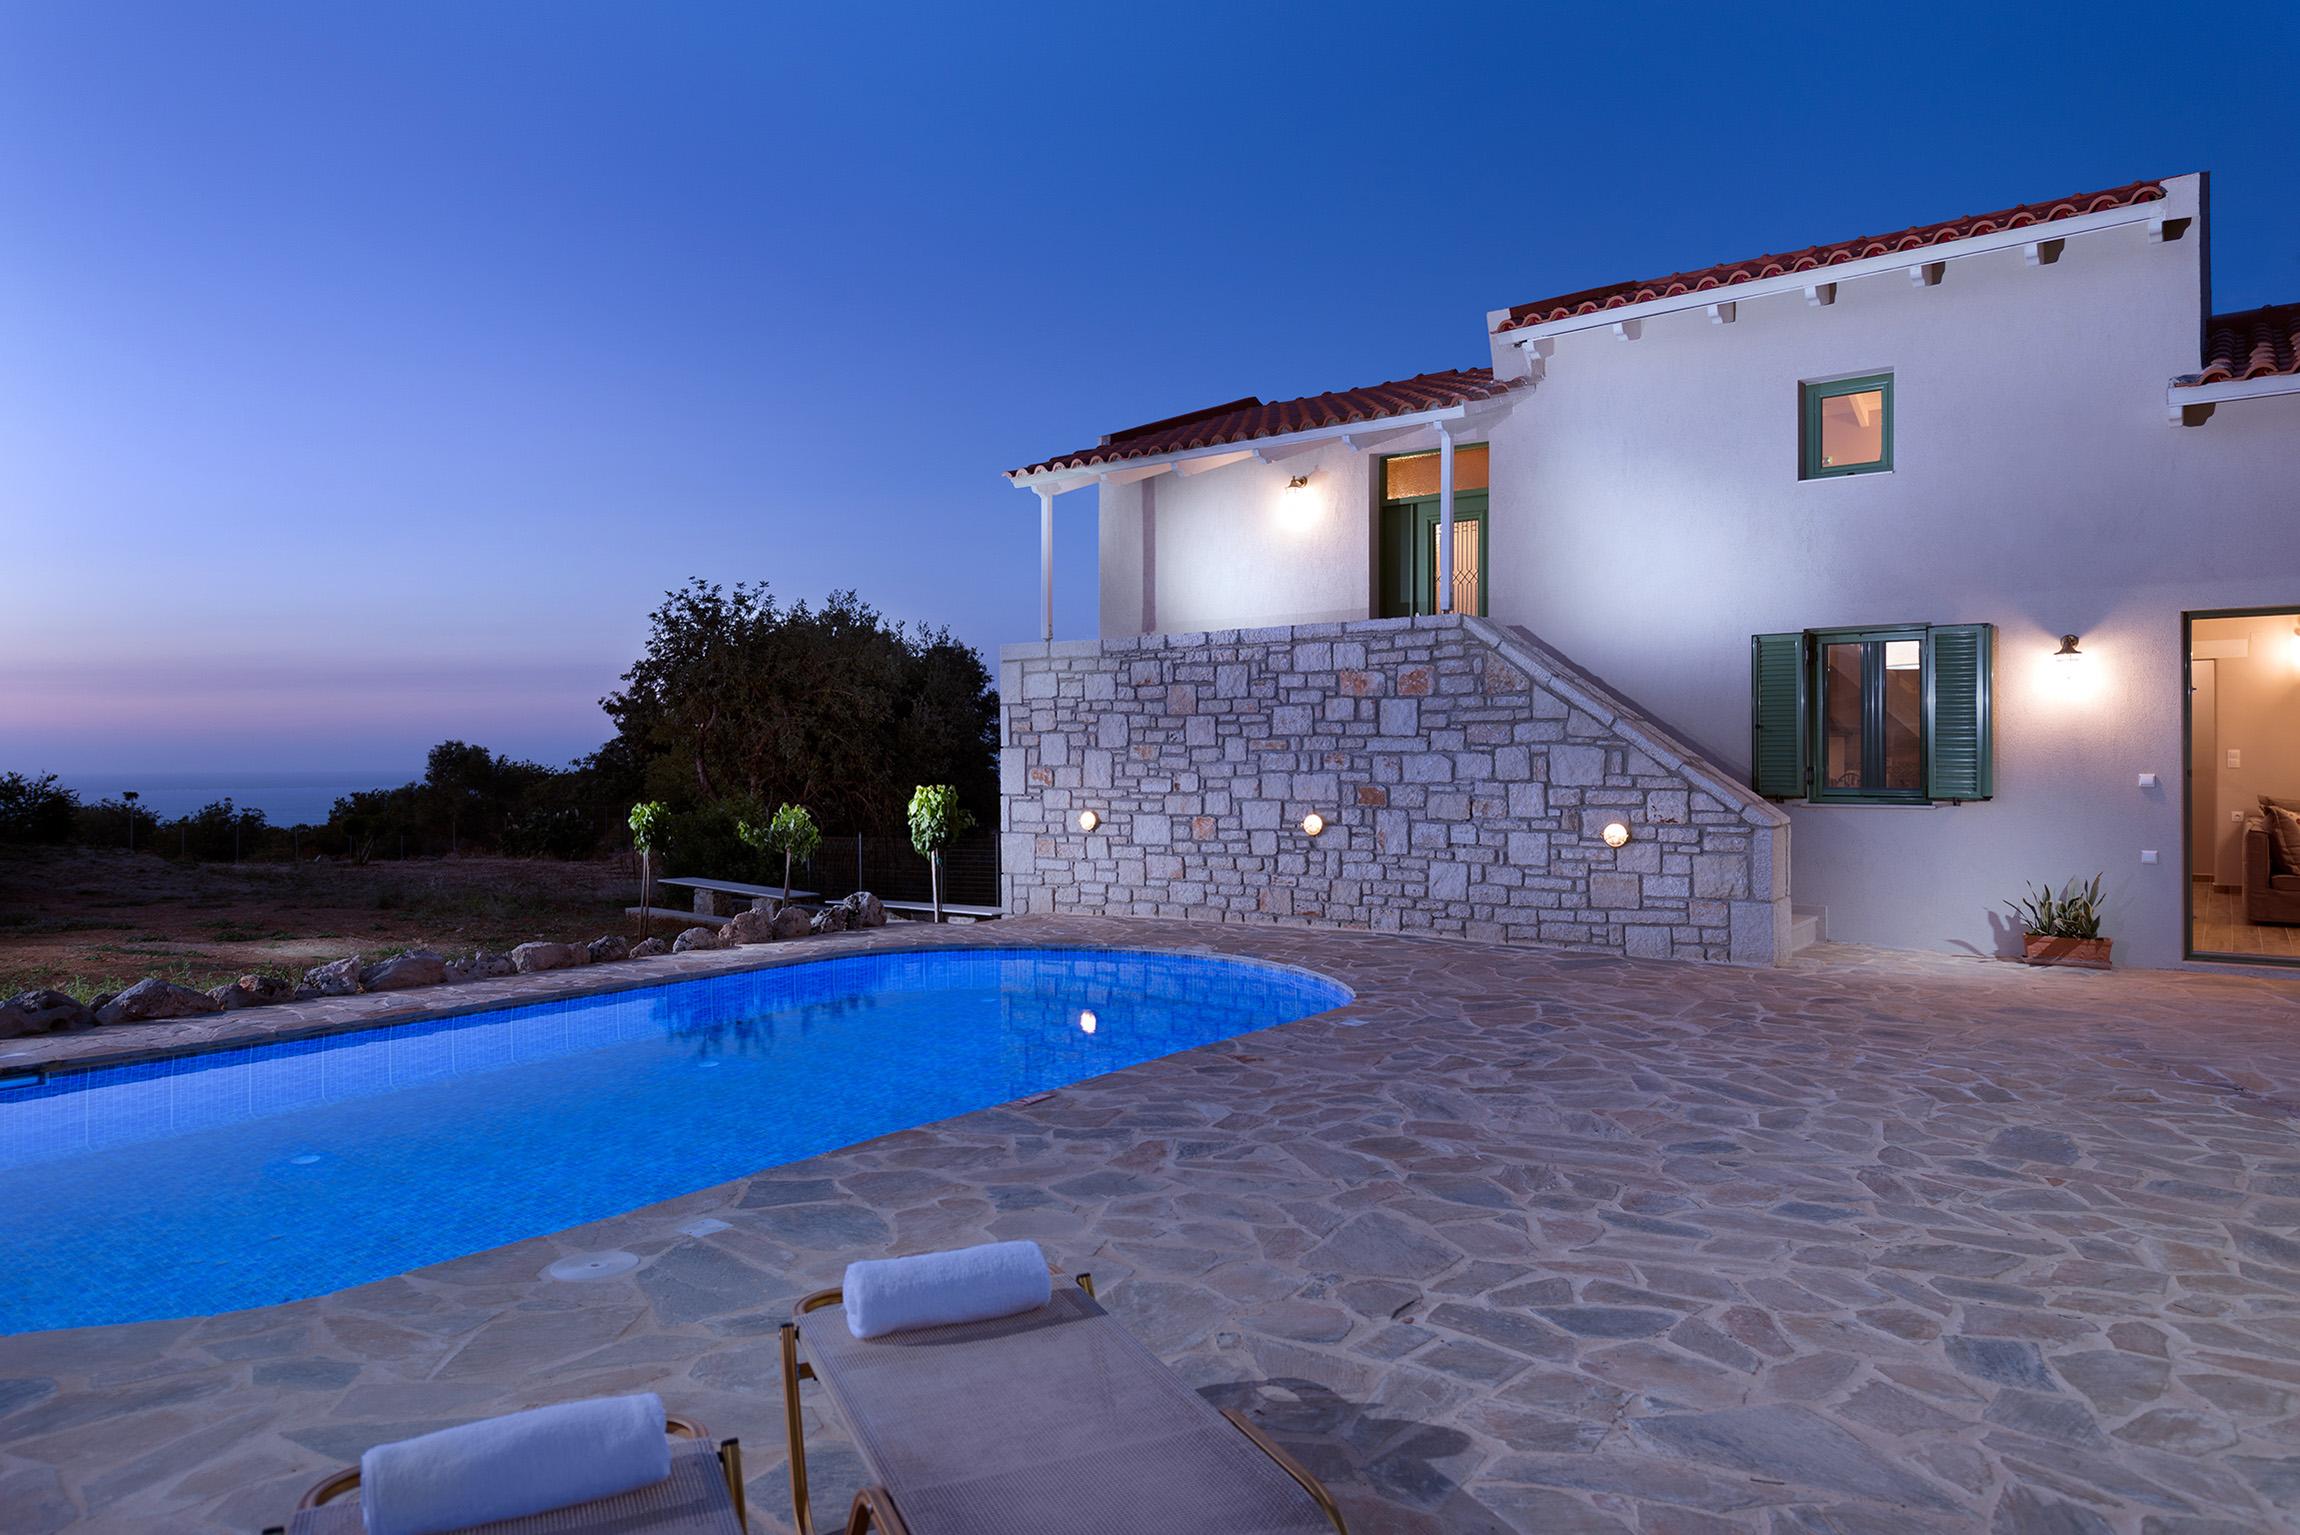 forest-villas-crete-sarpedon-swimming-pool-night.jpg